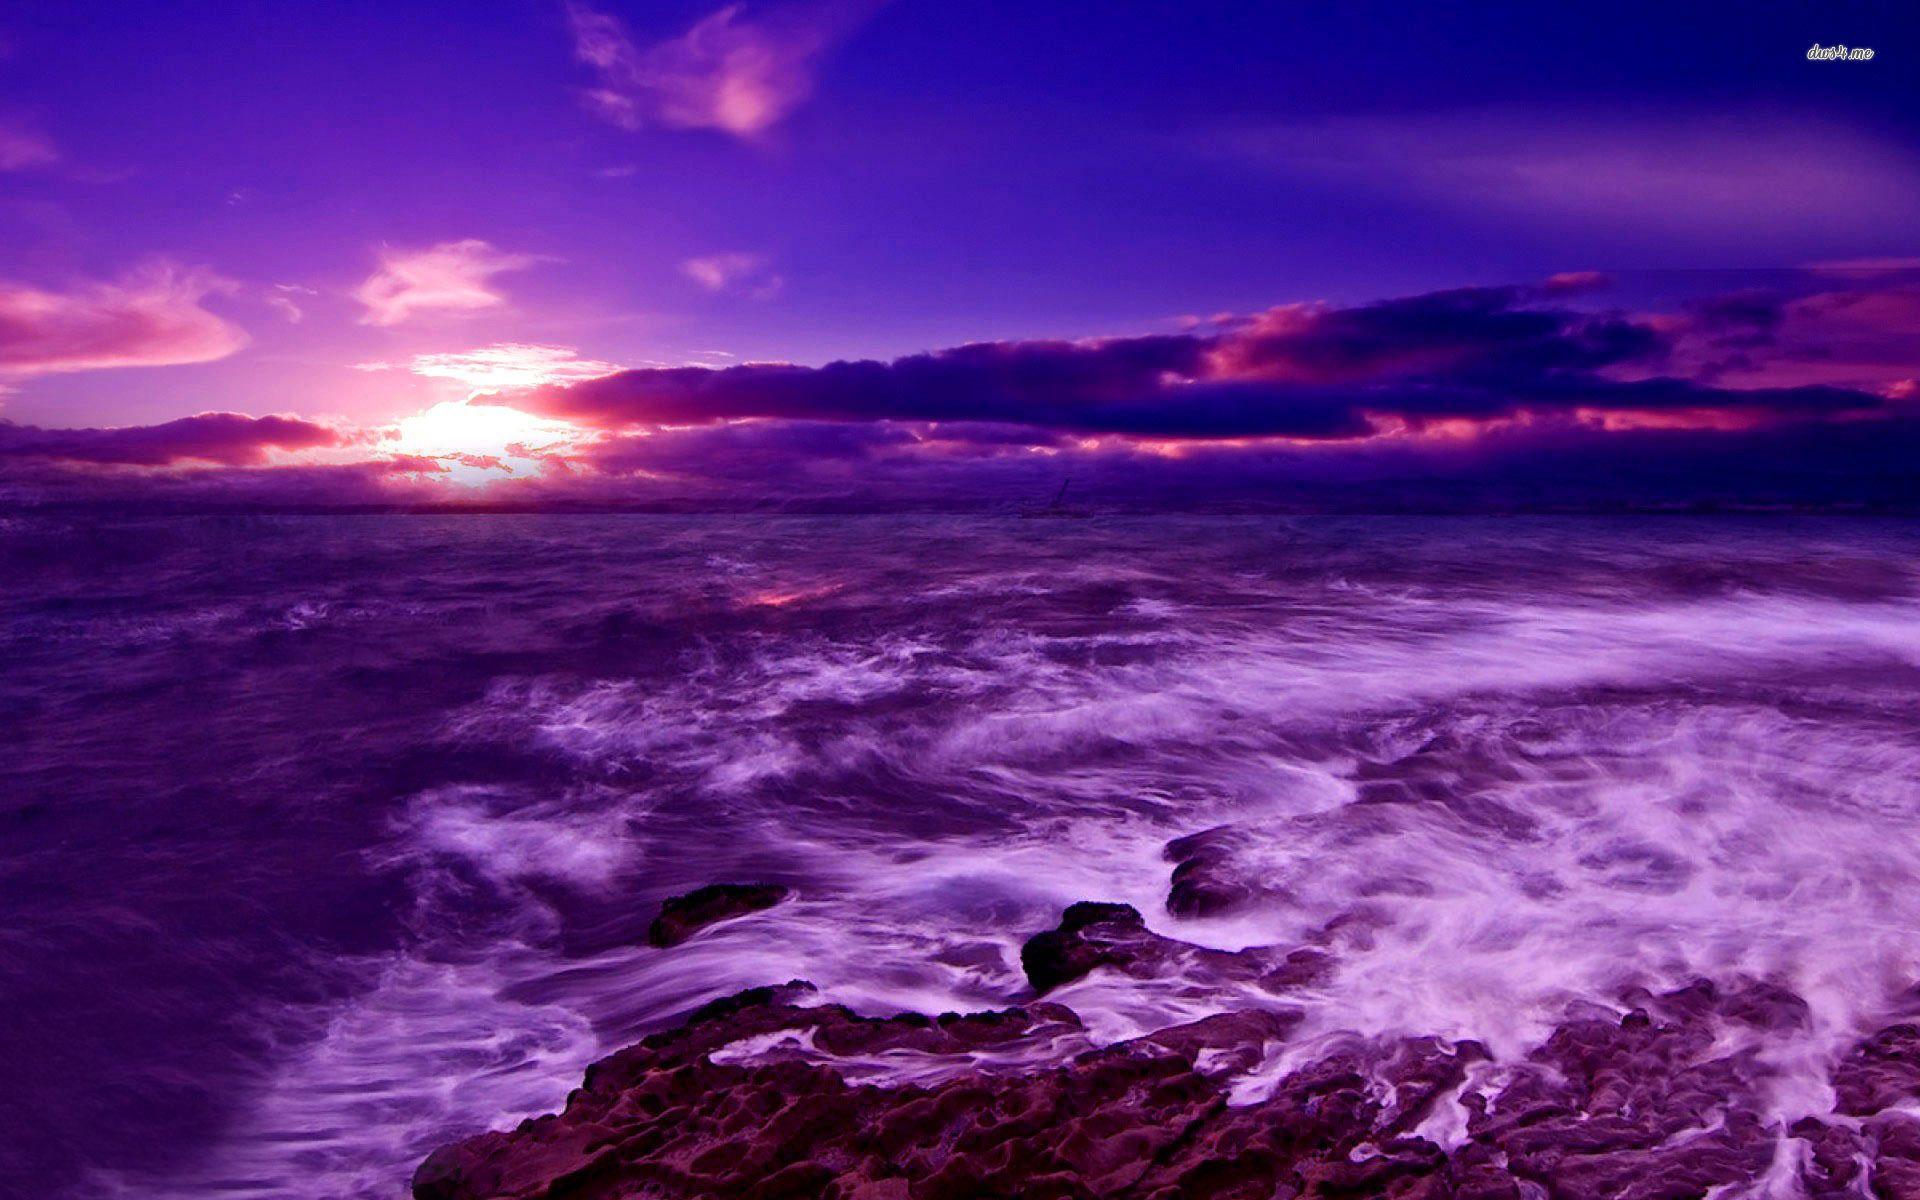 Purple Sunset Over The Sea Hd Wallpaper Beach Sunset Wallpaper Beach Wallpaper Sunset Wallpaper